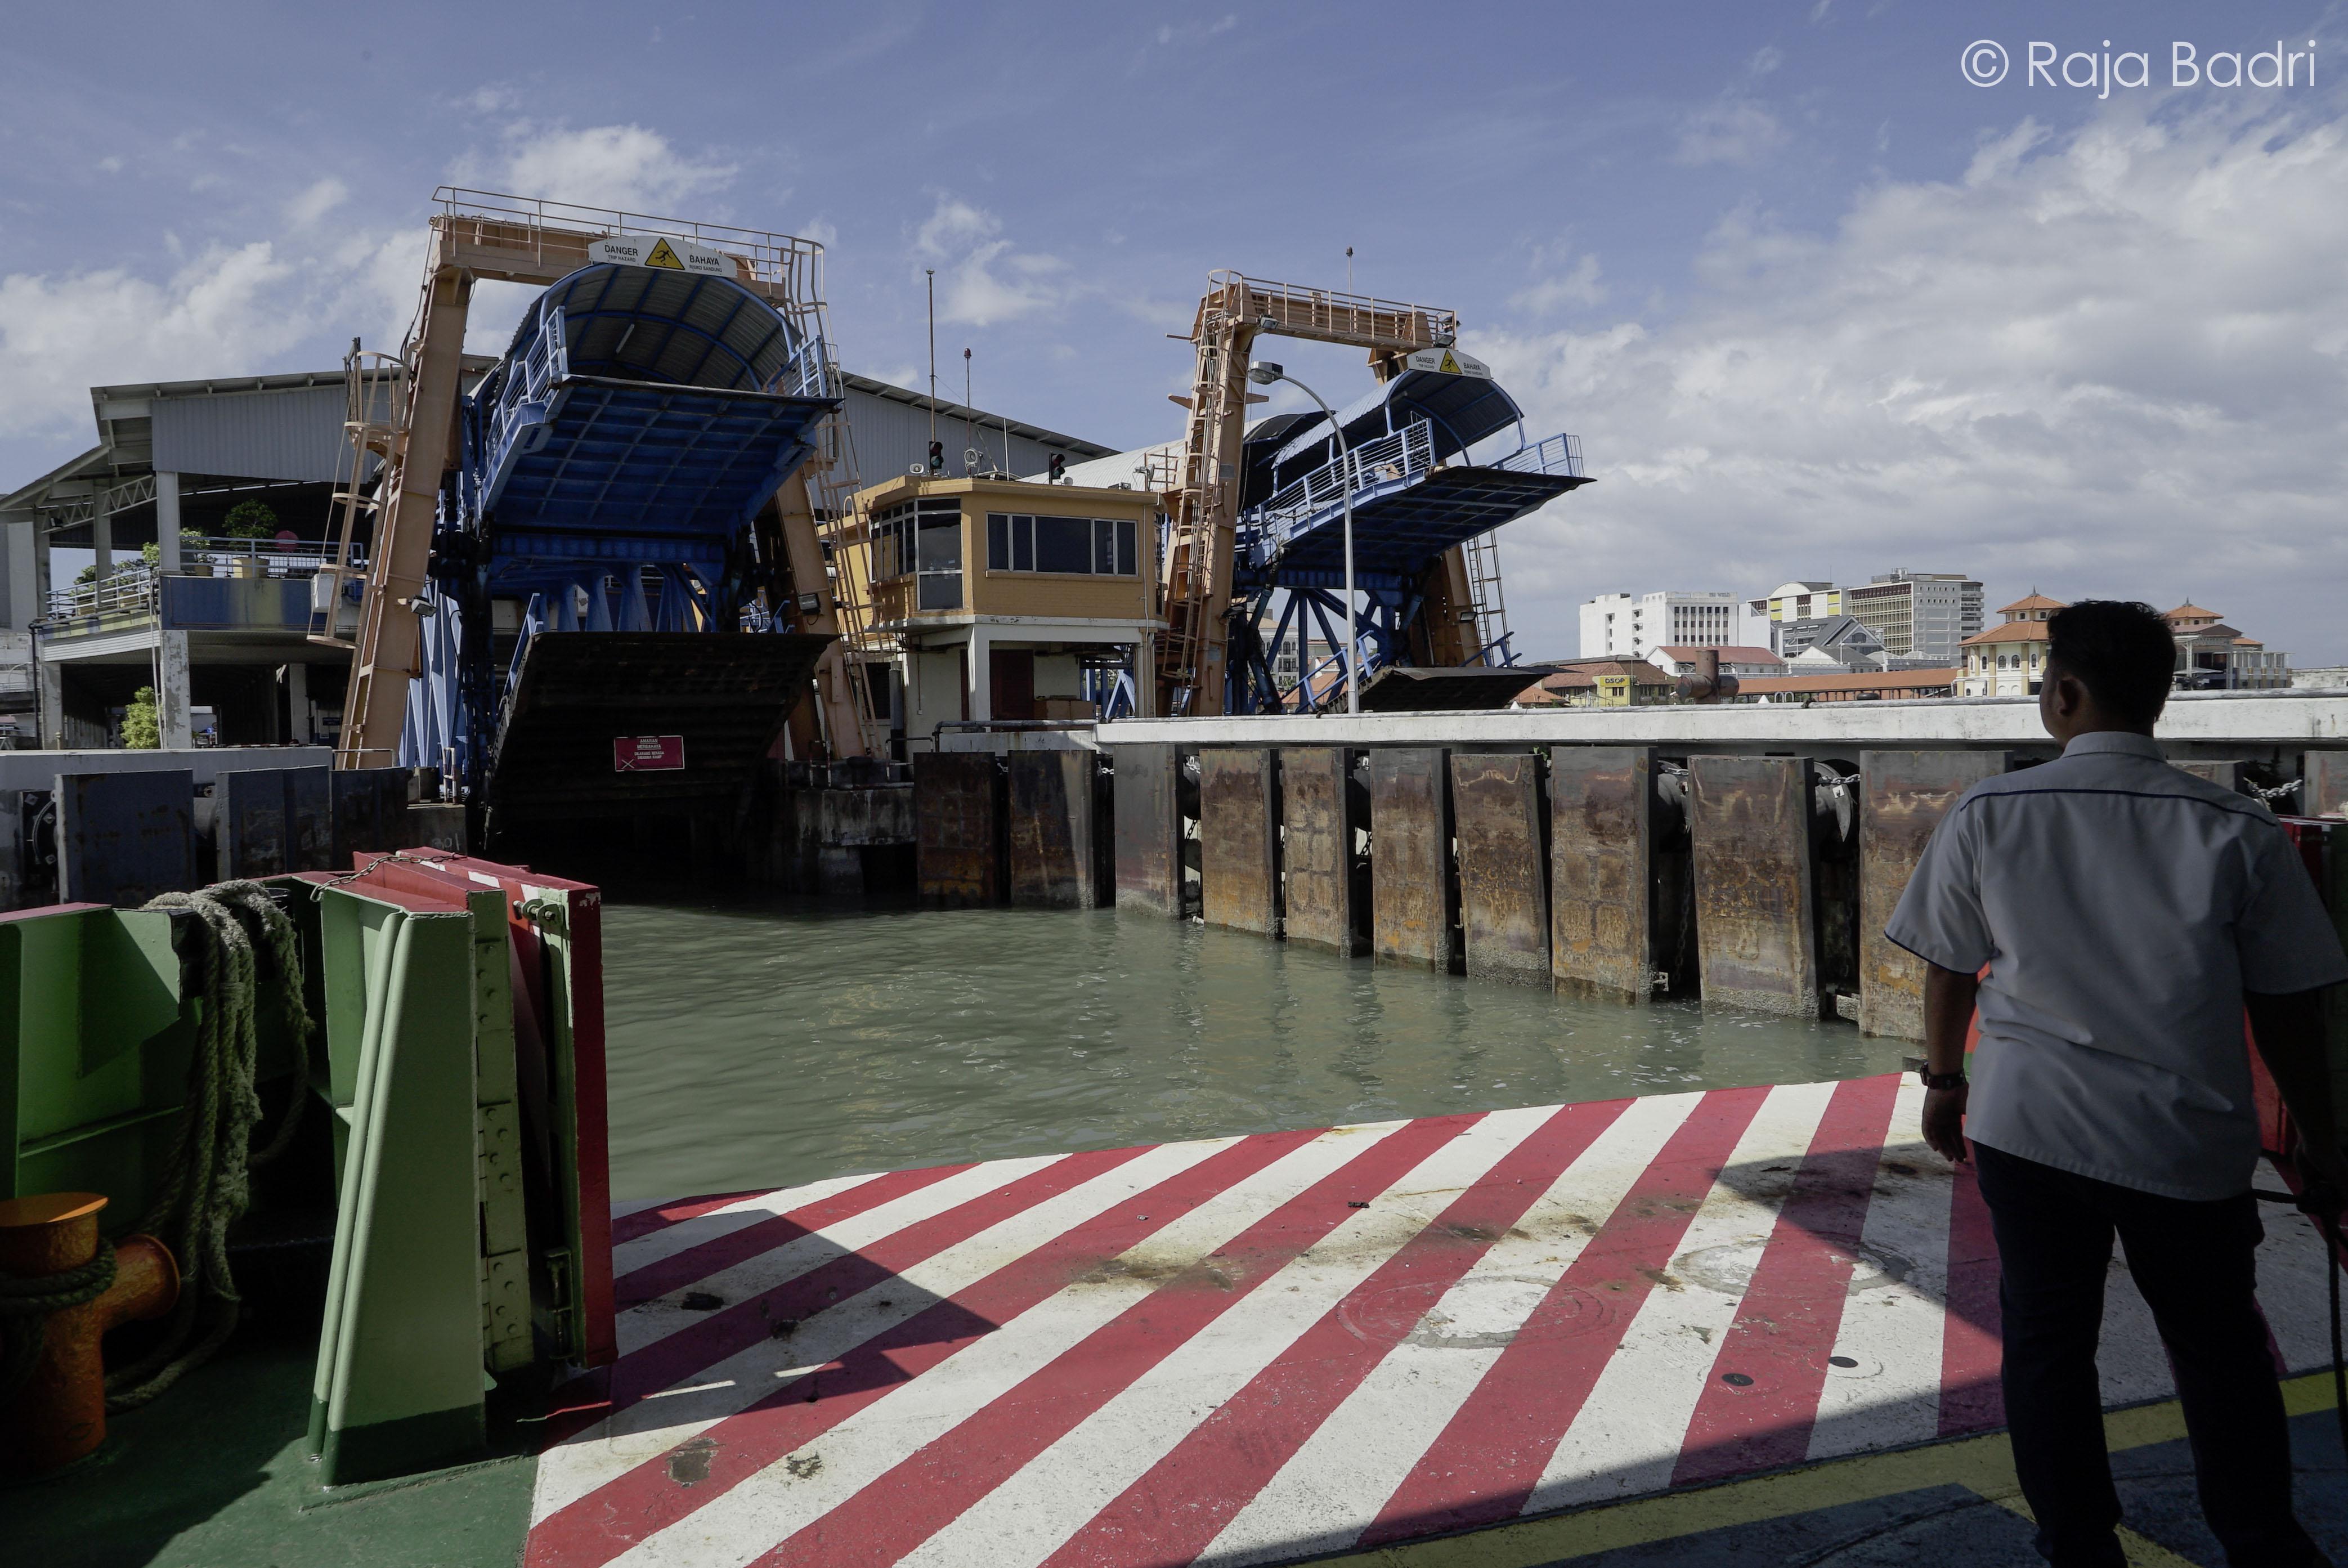 penang ferry 16